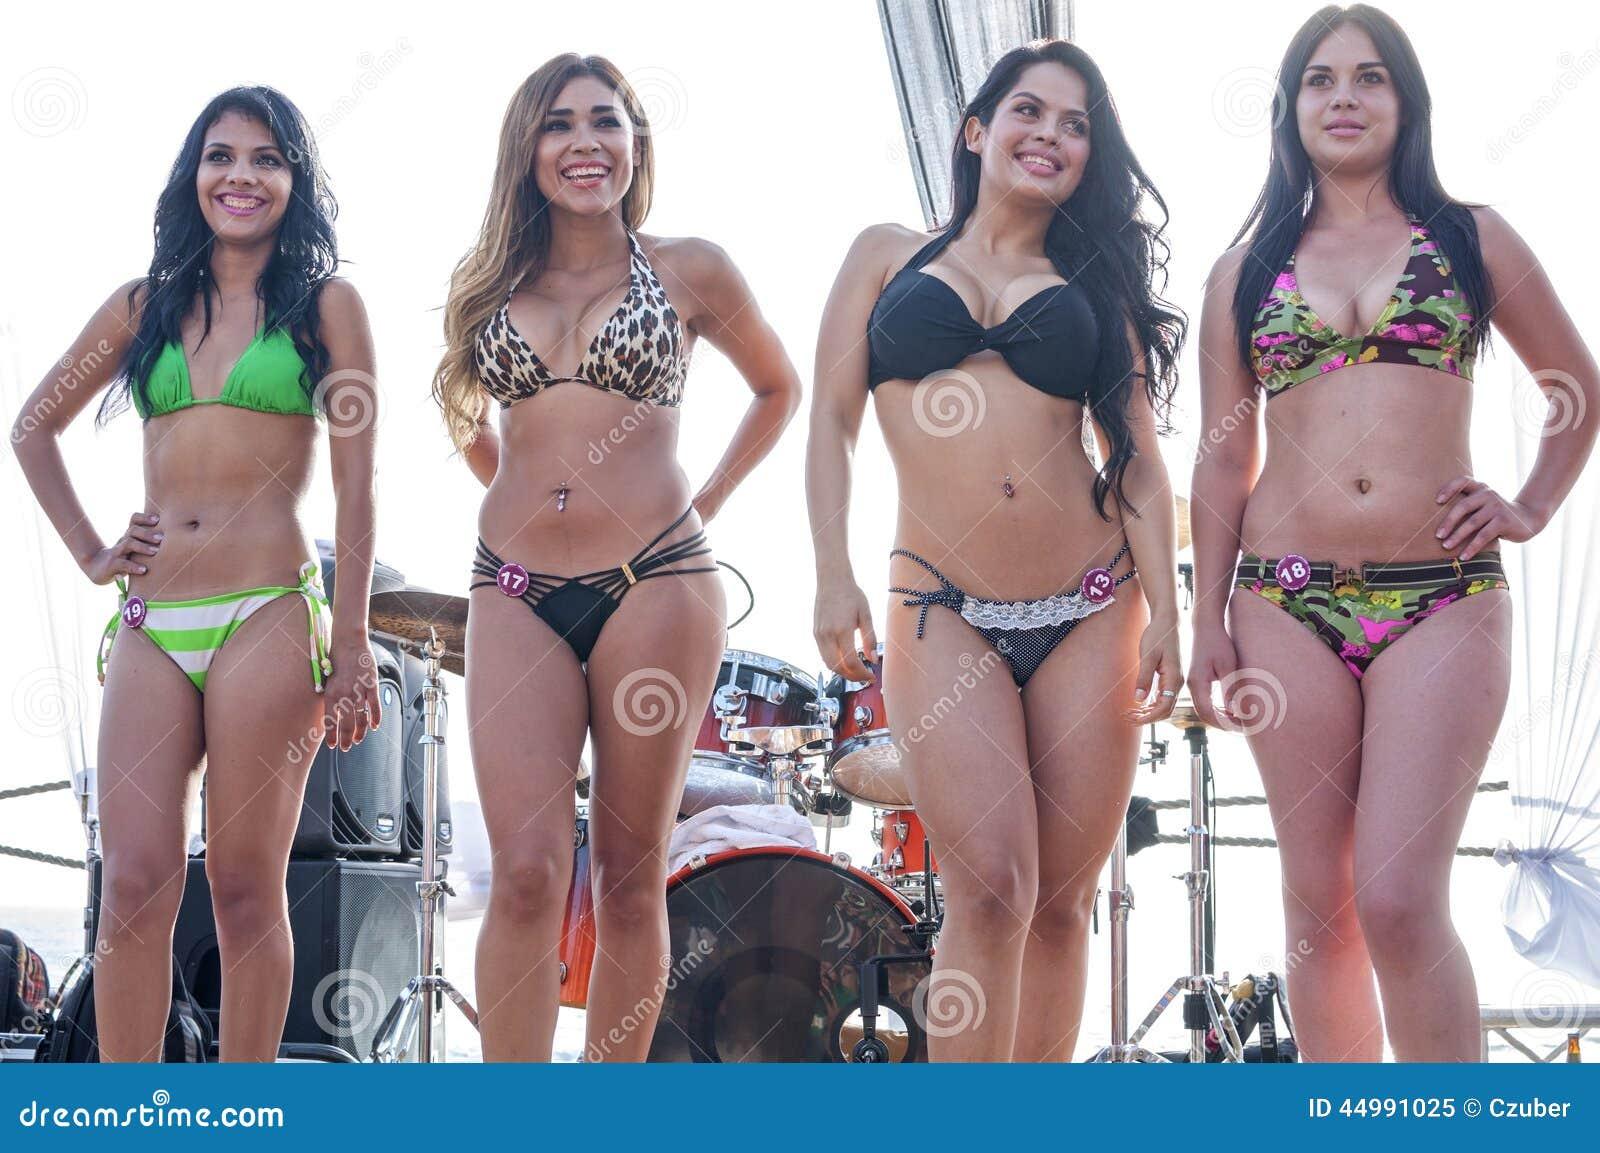 Comment créer un bikini de ruban adhésif -